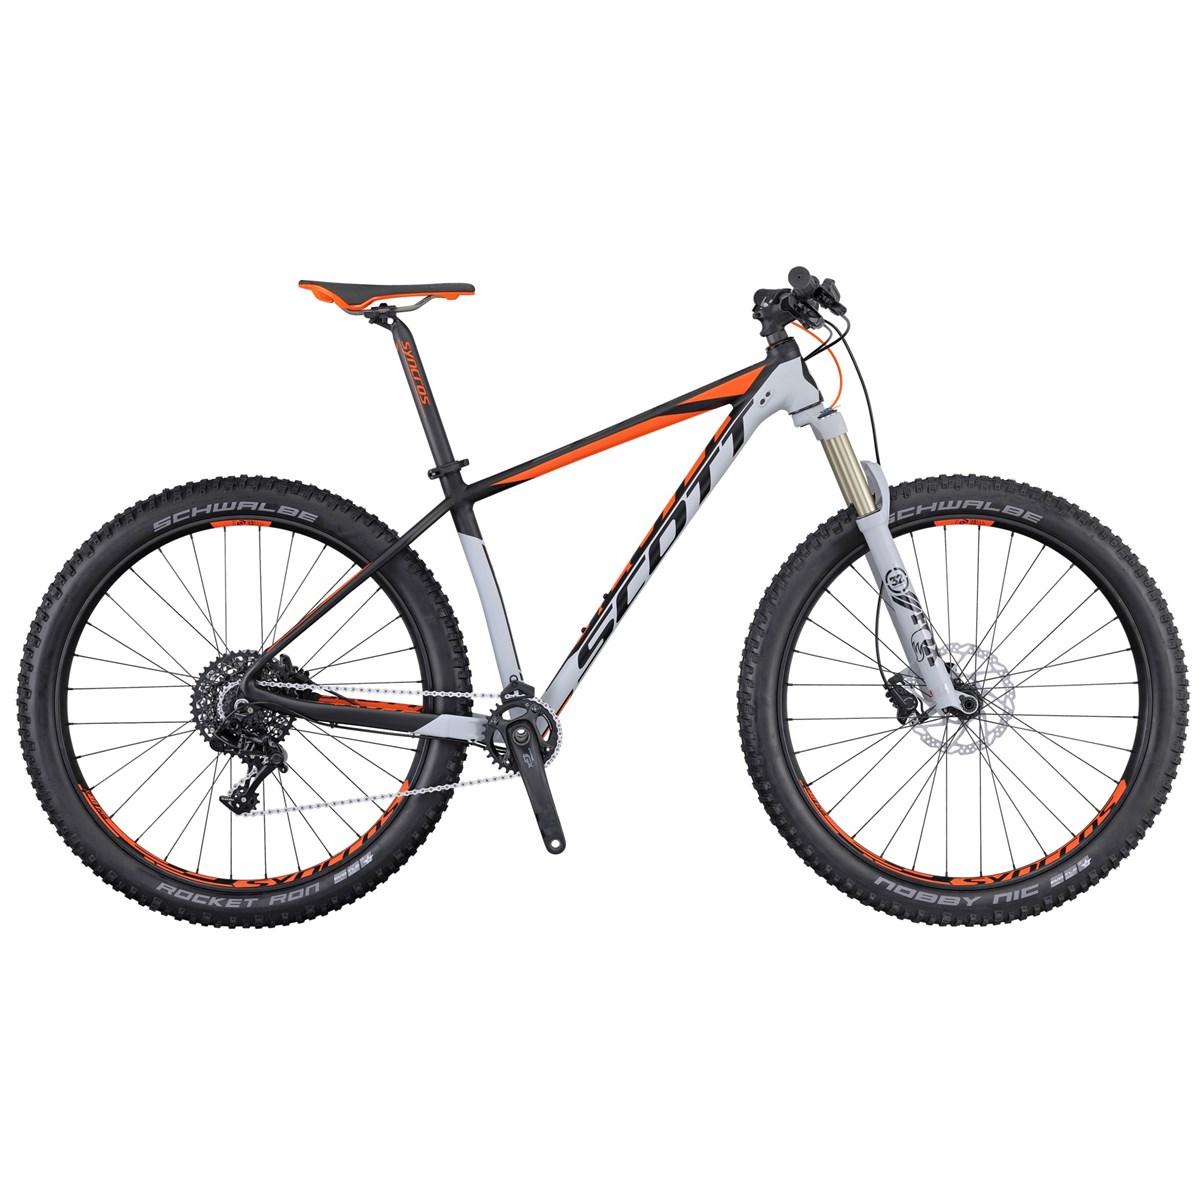 Scott Scale 710 Plus 2016 Hardtail Mountain Bike £1,899.00